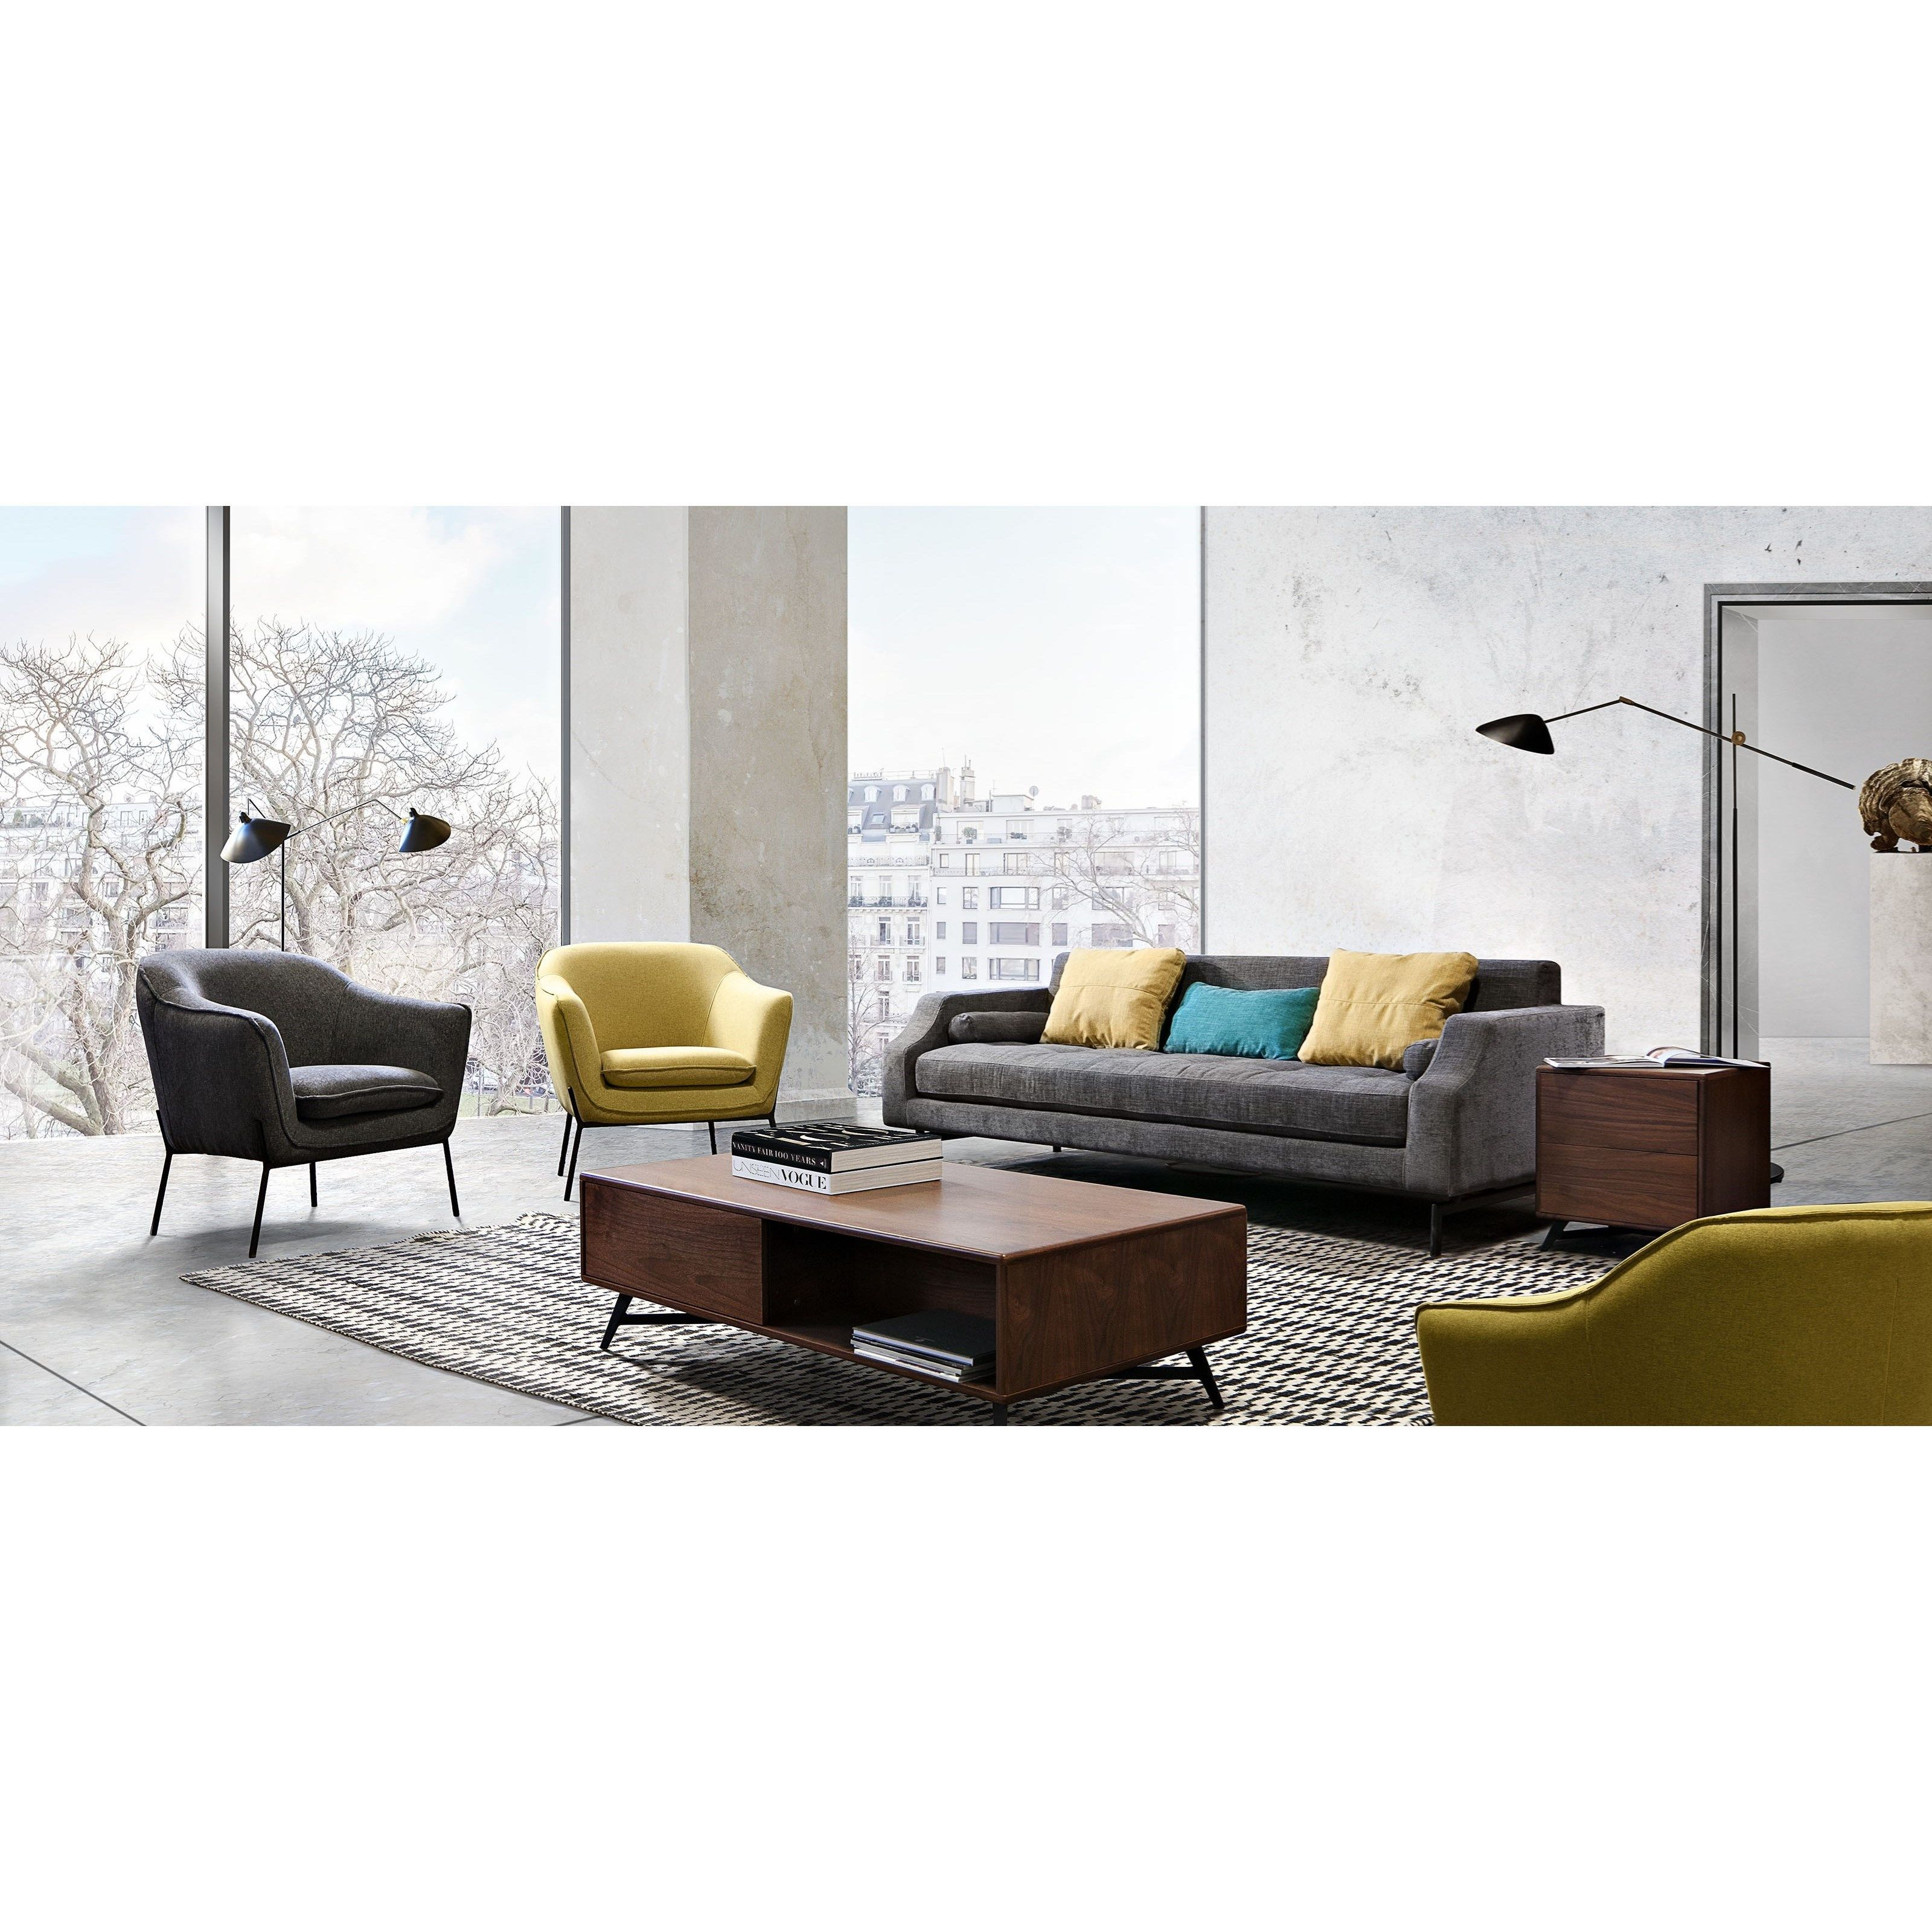 Diamond Sofa Status Chair Red Knot Grayfurniture Yellow Contemporary Redknothawaii